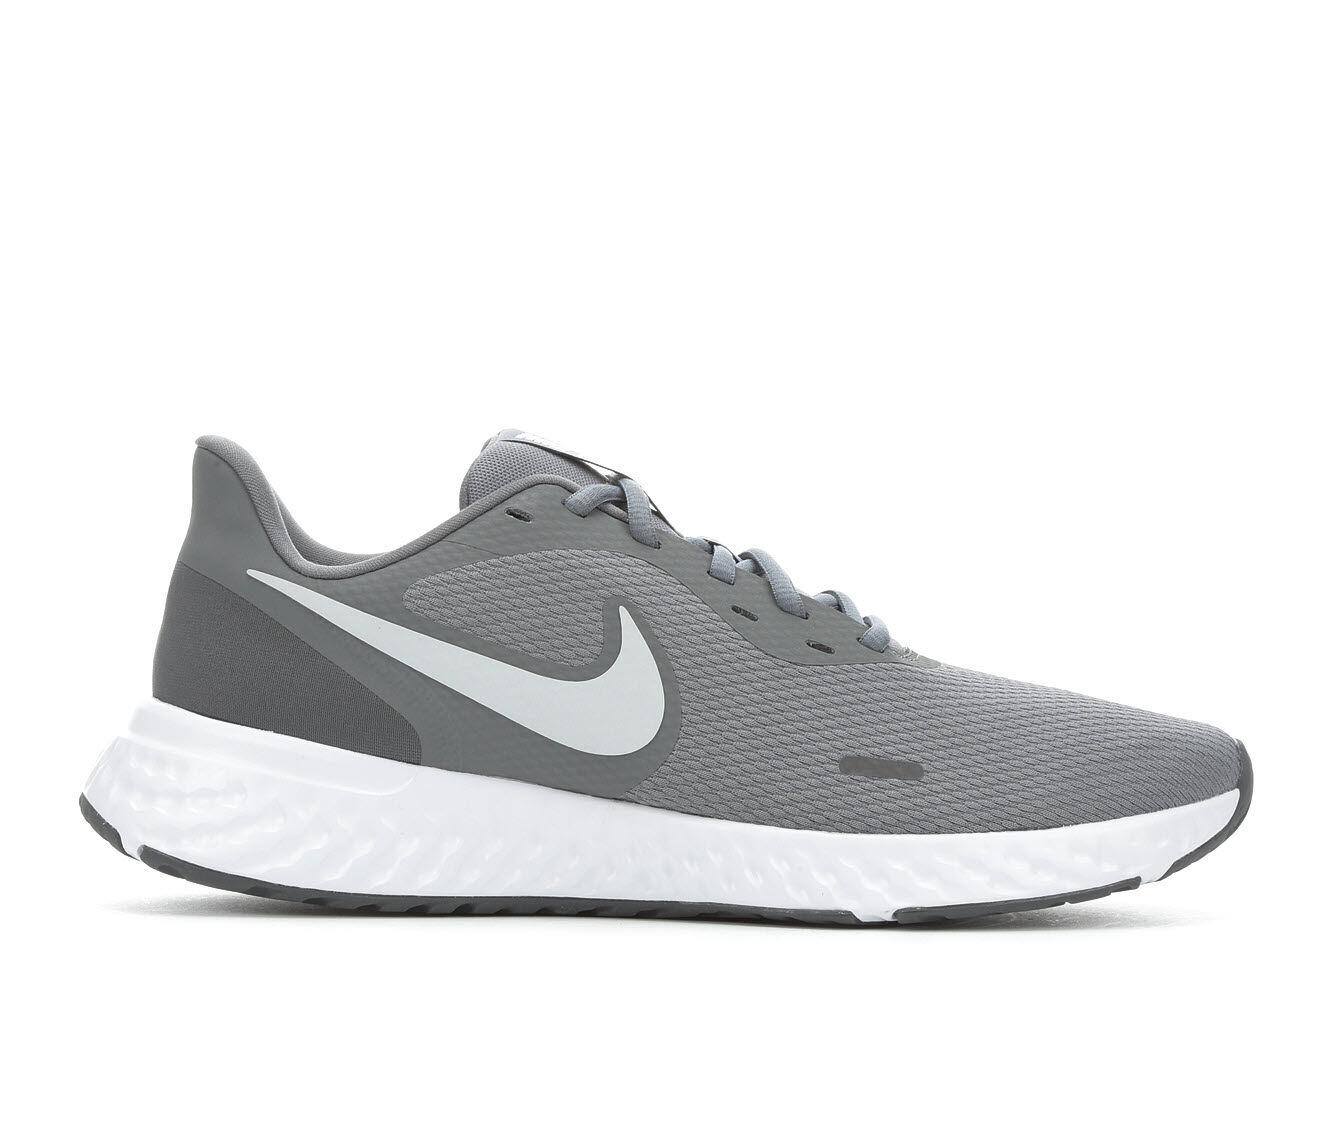 Men's Nike Shoes & Sneakers